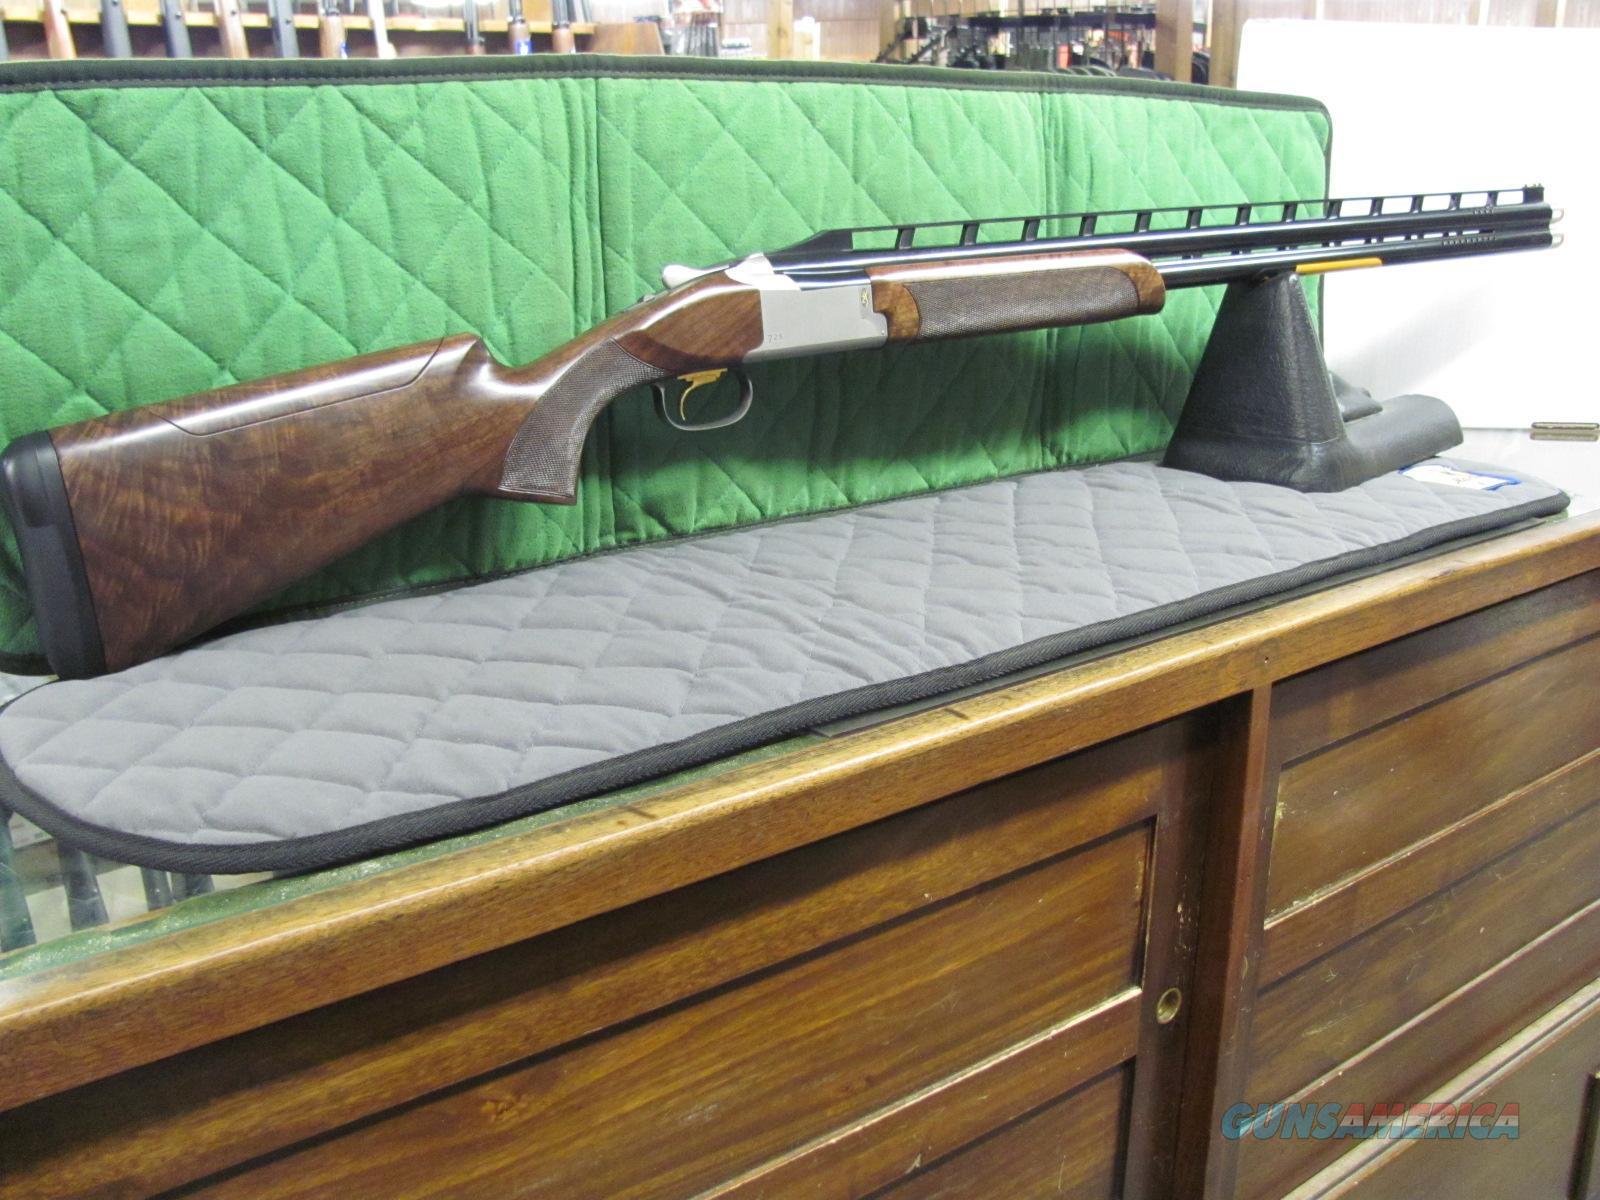 Browning Citori 725 High Rib Sporting w/ Adj Comb 30 Inch  **NEW**  Guns > Shotguns > Browning Shotguns > Over Unders > Citori > Trap/Skeet